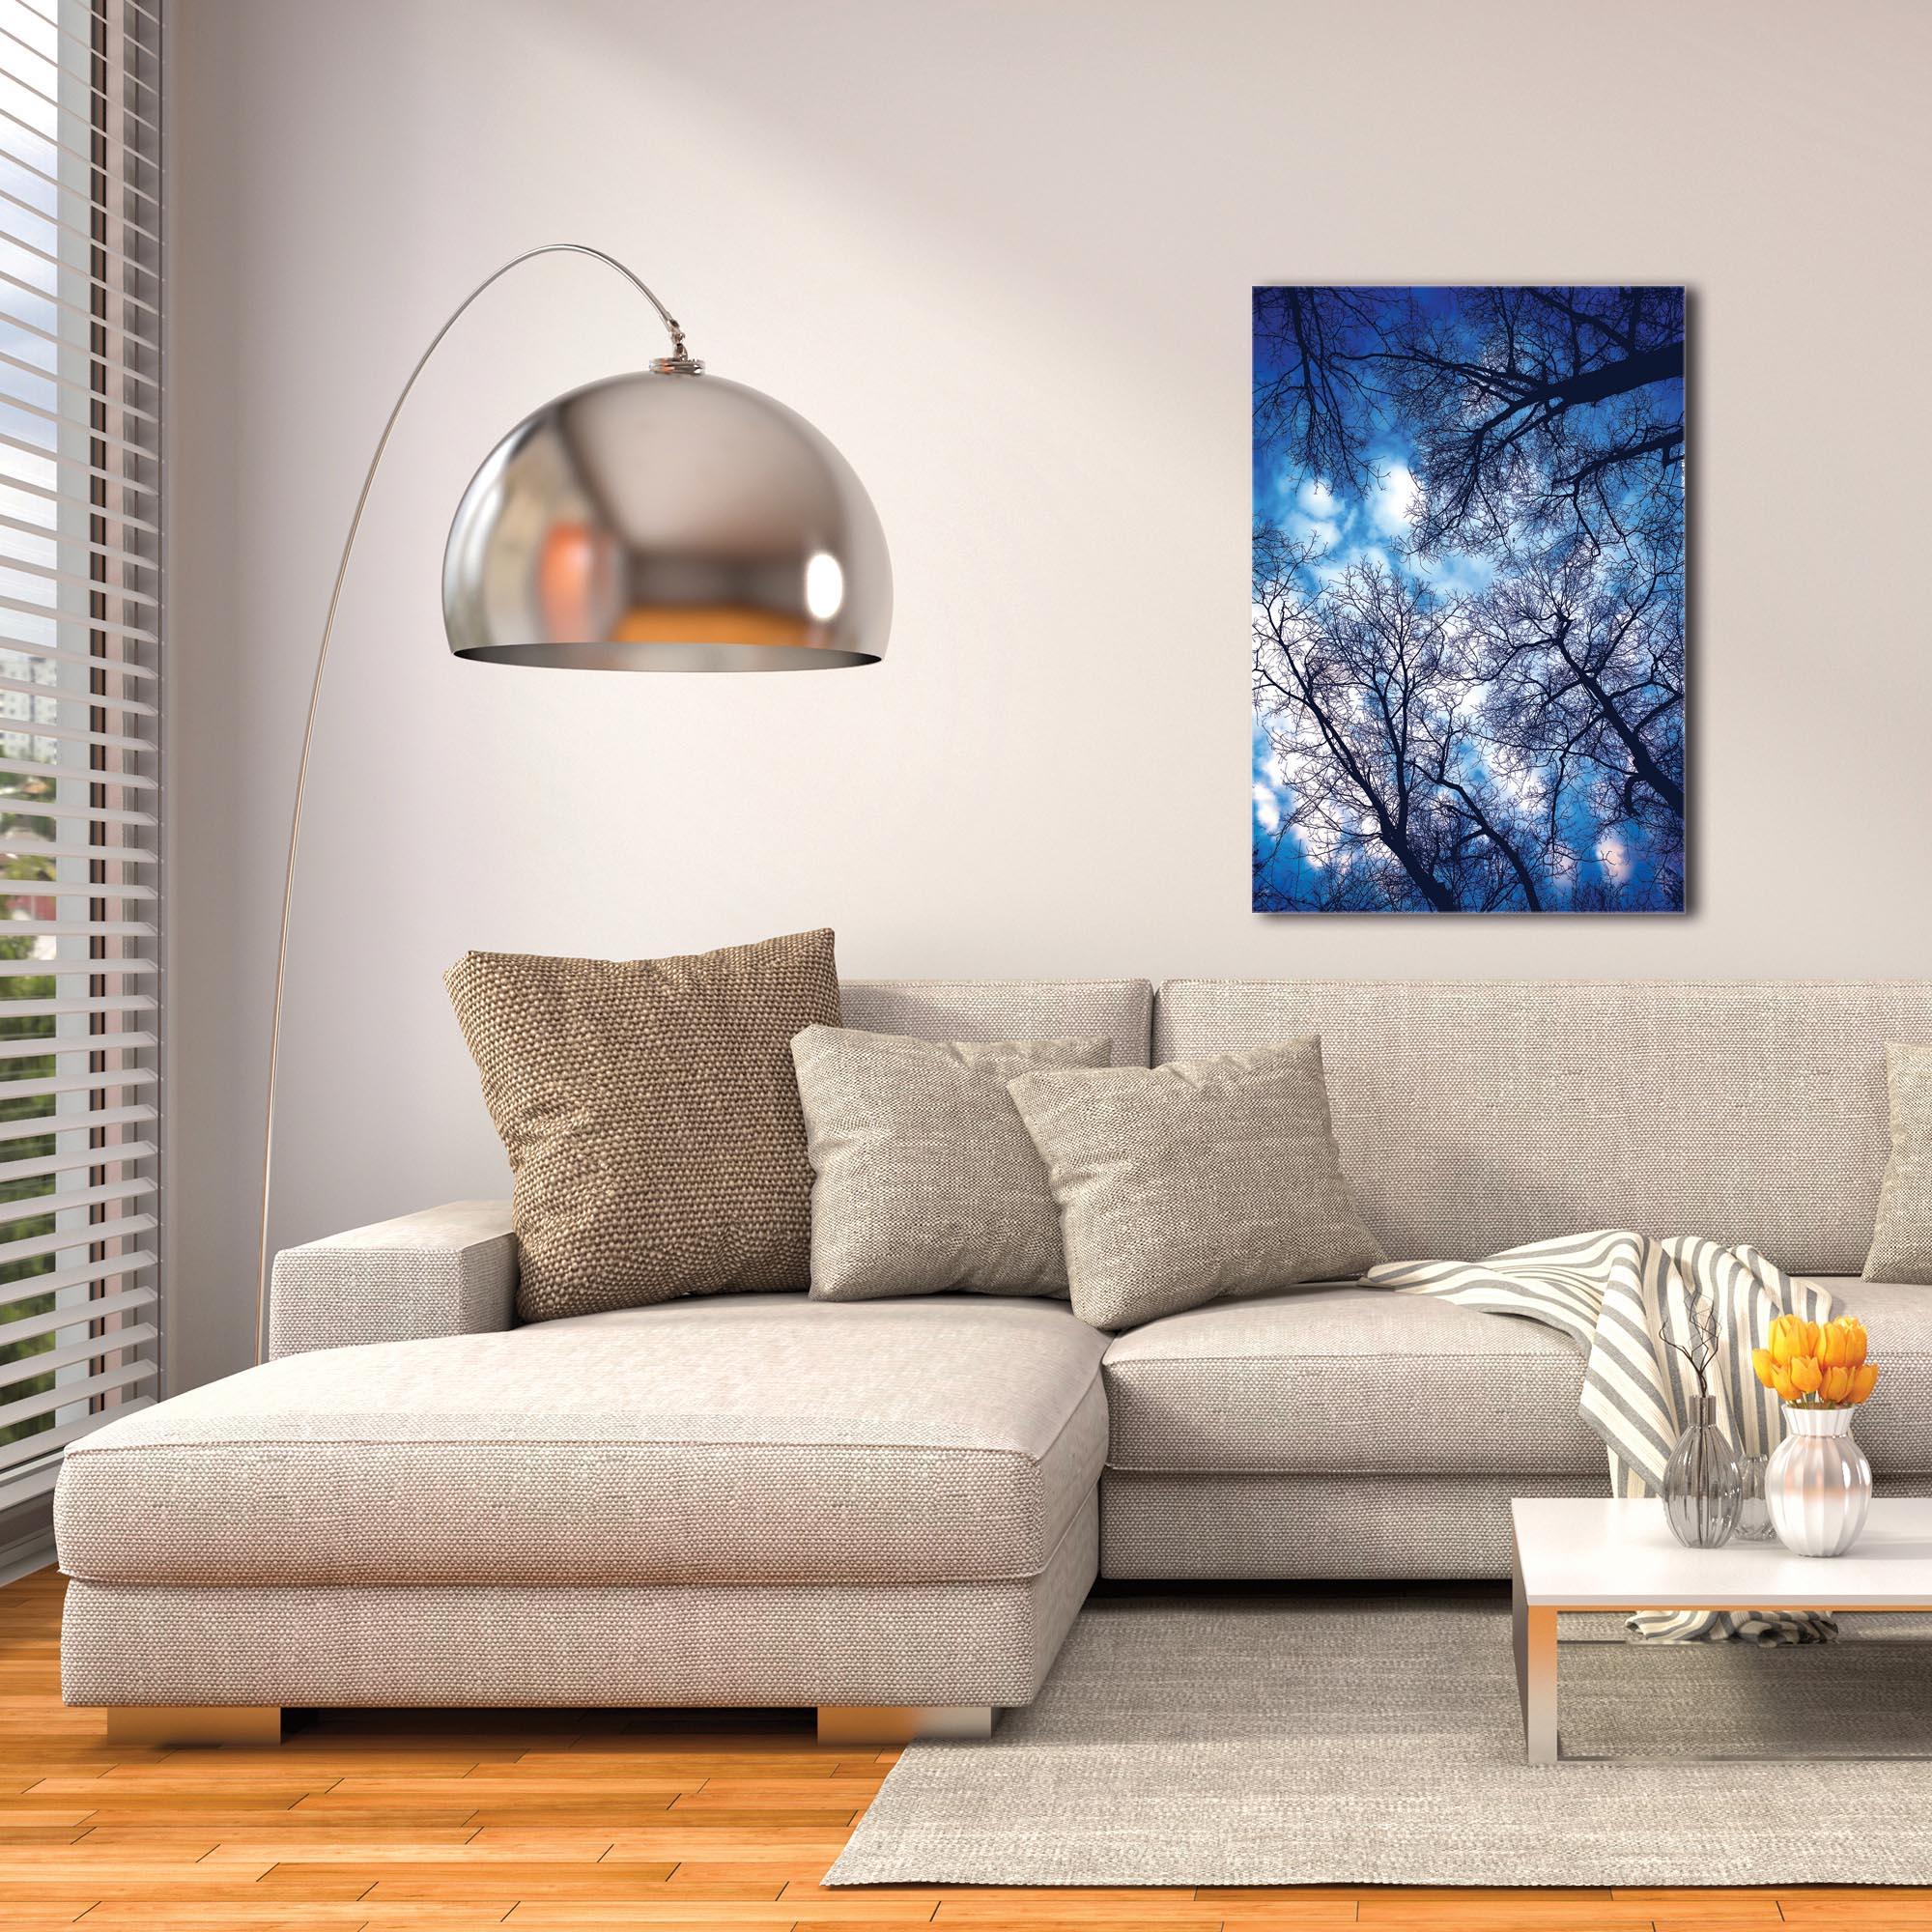 Landscape Photography 'Sky Vains' - Winter Scene Art on Metal or Plexiglass - Image 3